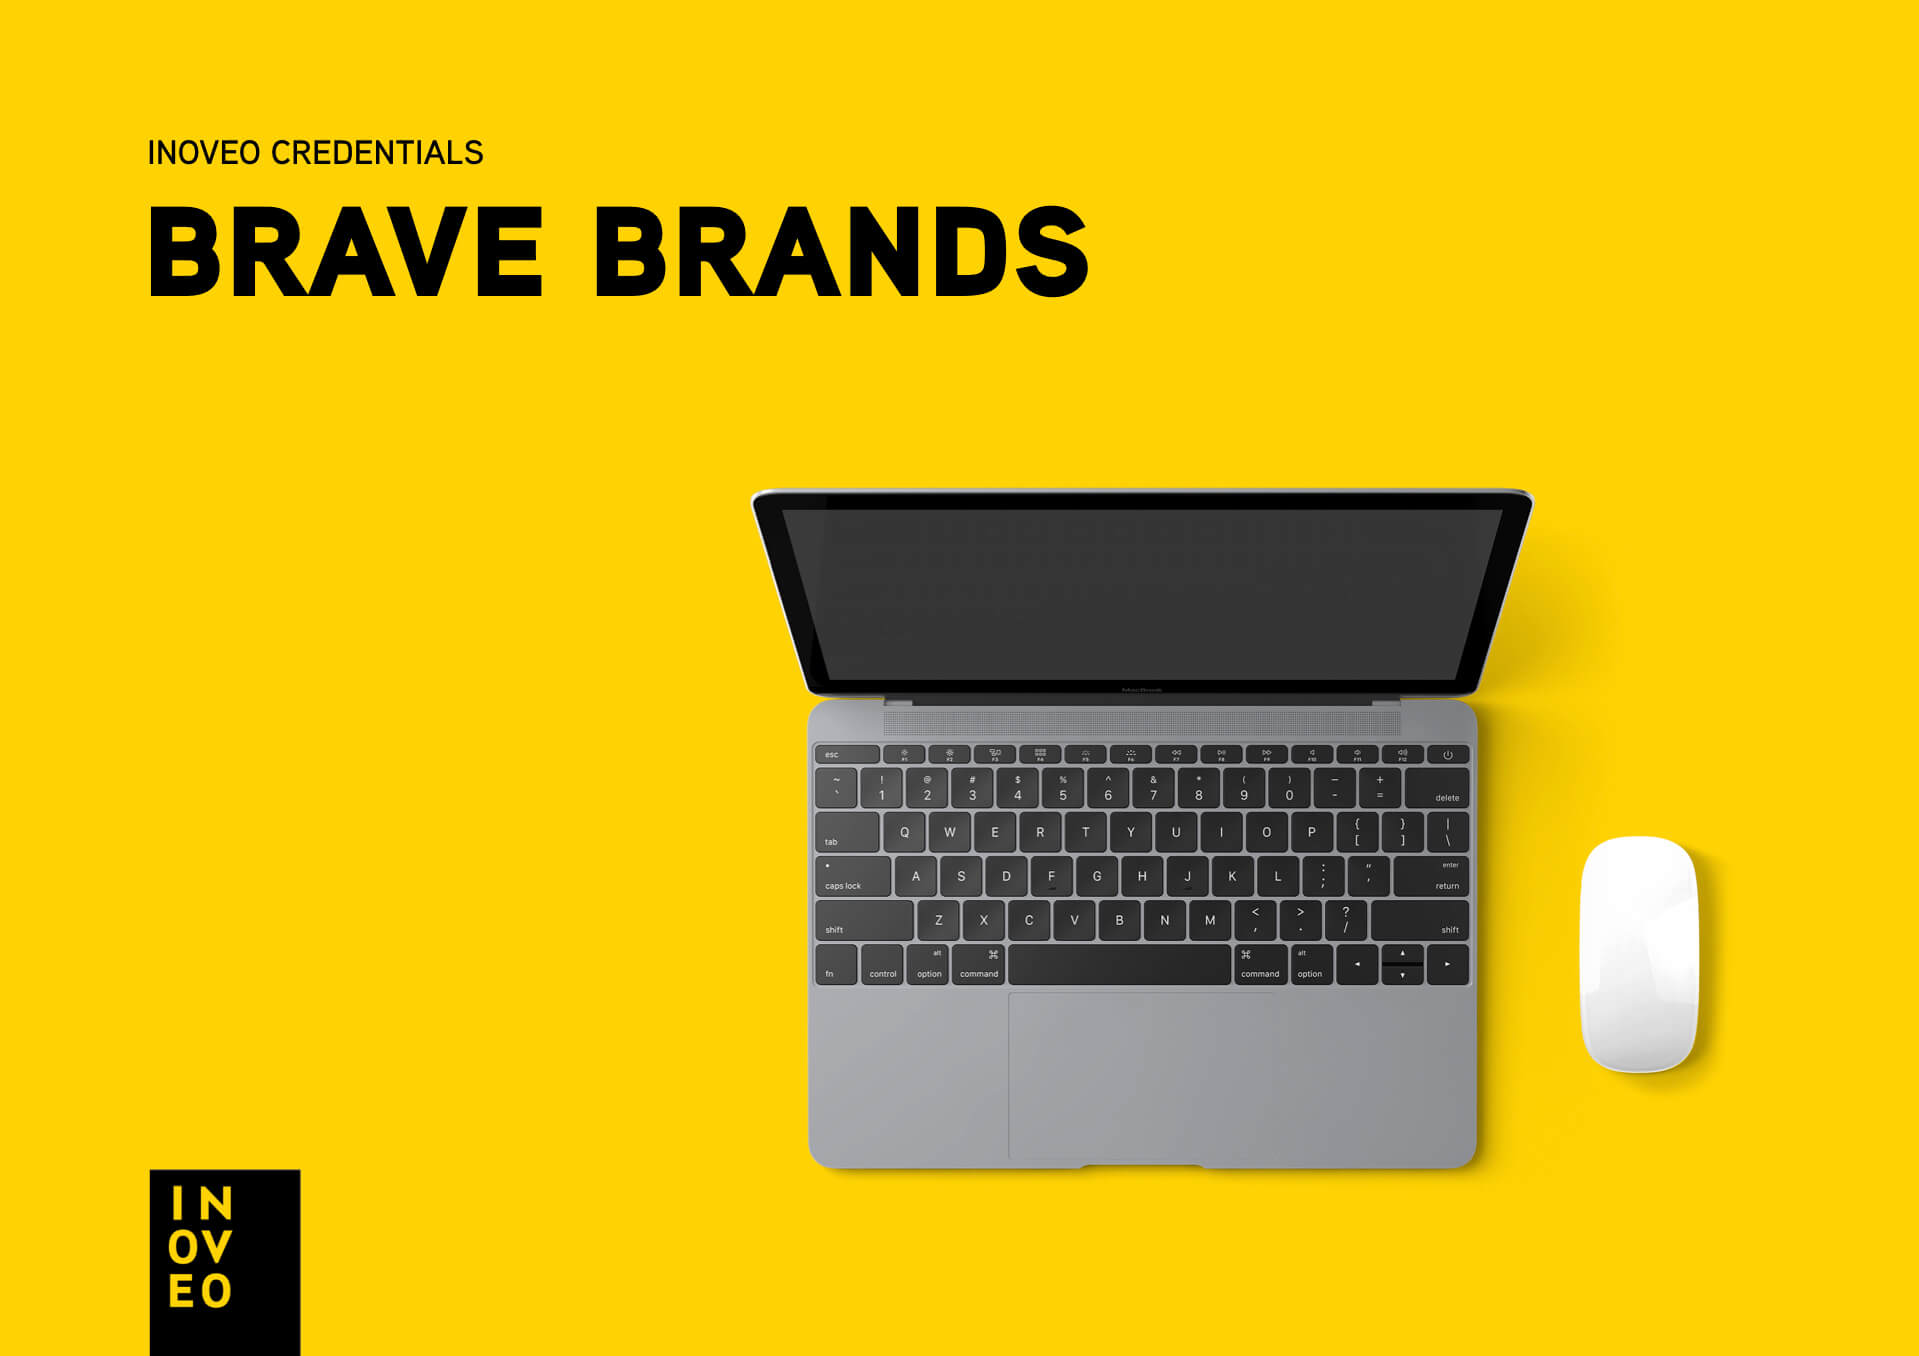 brave brands credentials INOVEO branding